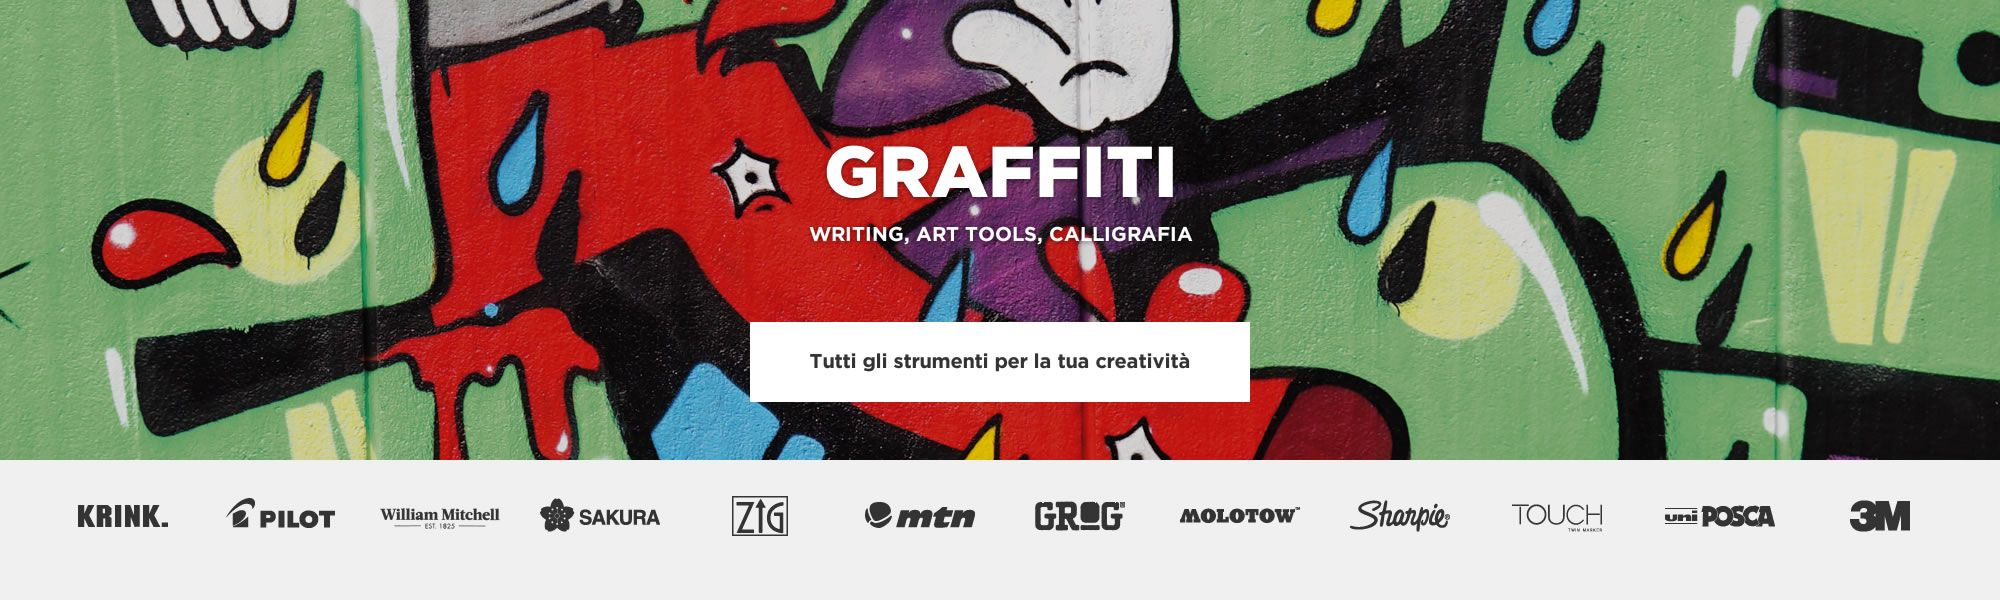 STREETWEAR Sneakers Abbigliamento Accessori · GRAFFITI Witing b7c51b4b696a